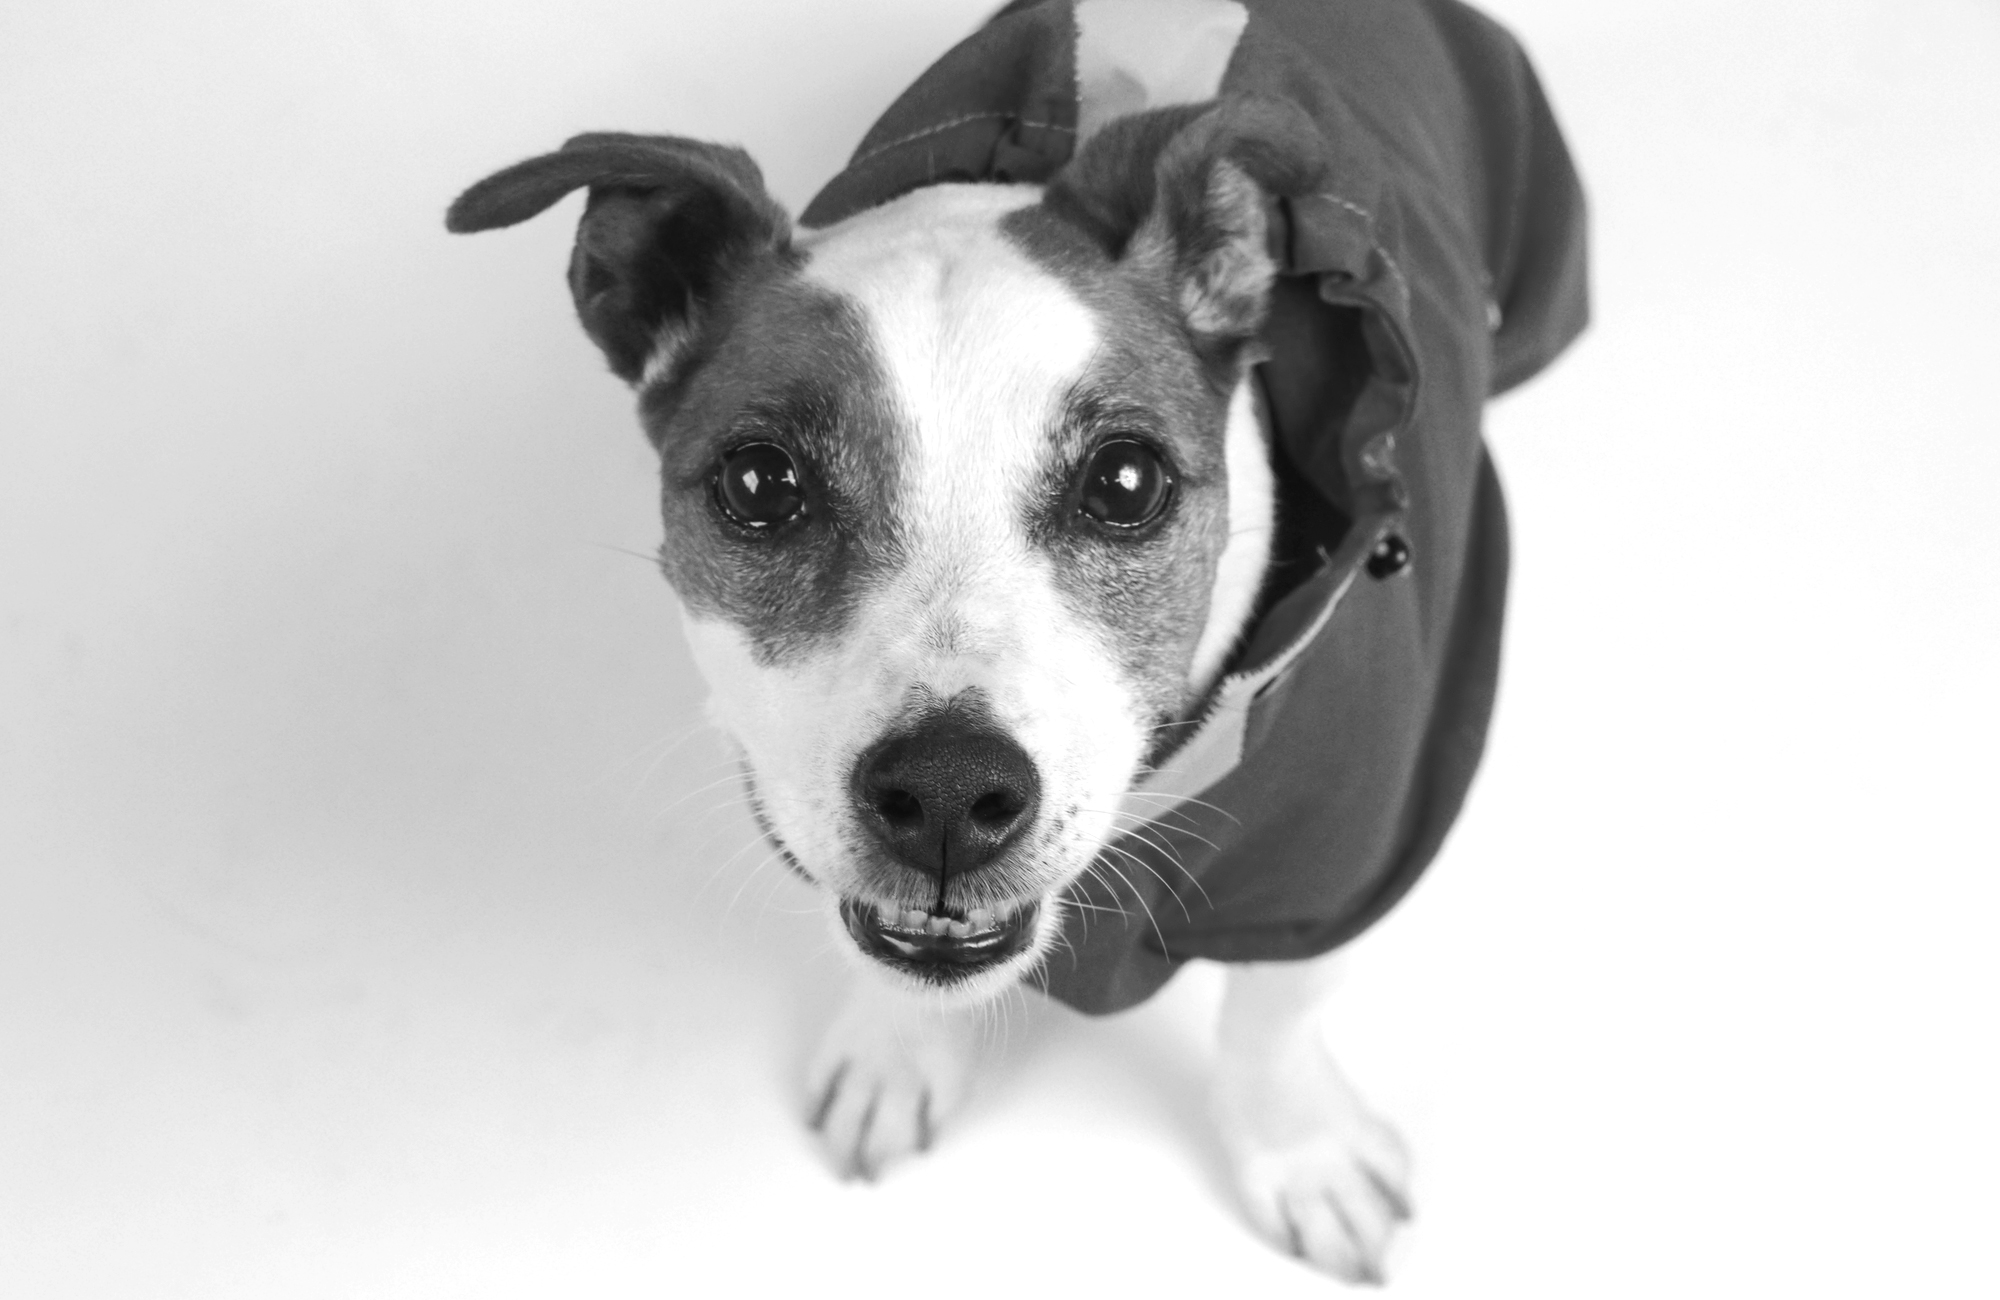 BEAST COATS ギャラリー : ジャックラッセルテリアのロビンさん with Dogsnug のレインコート